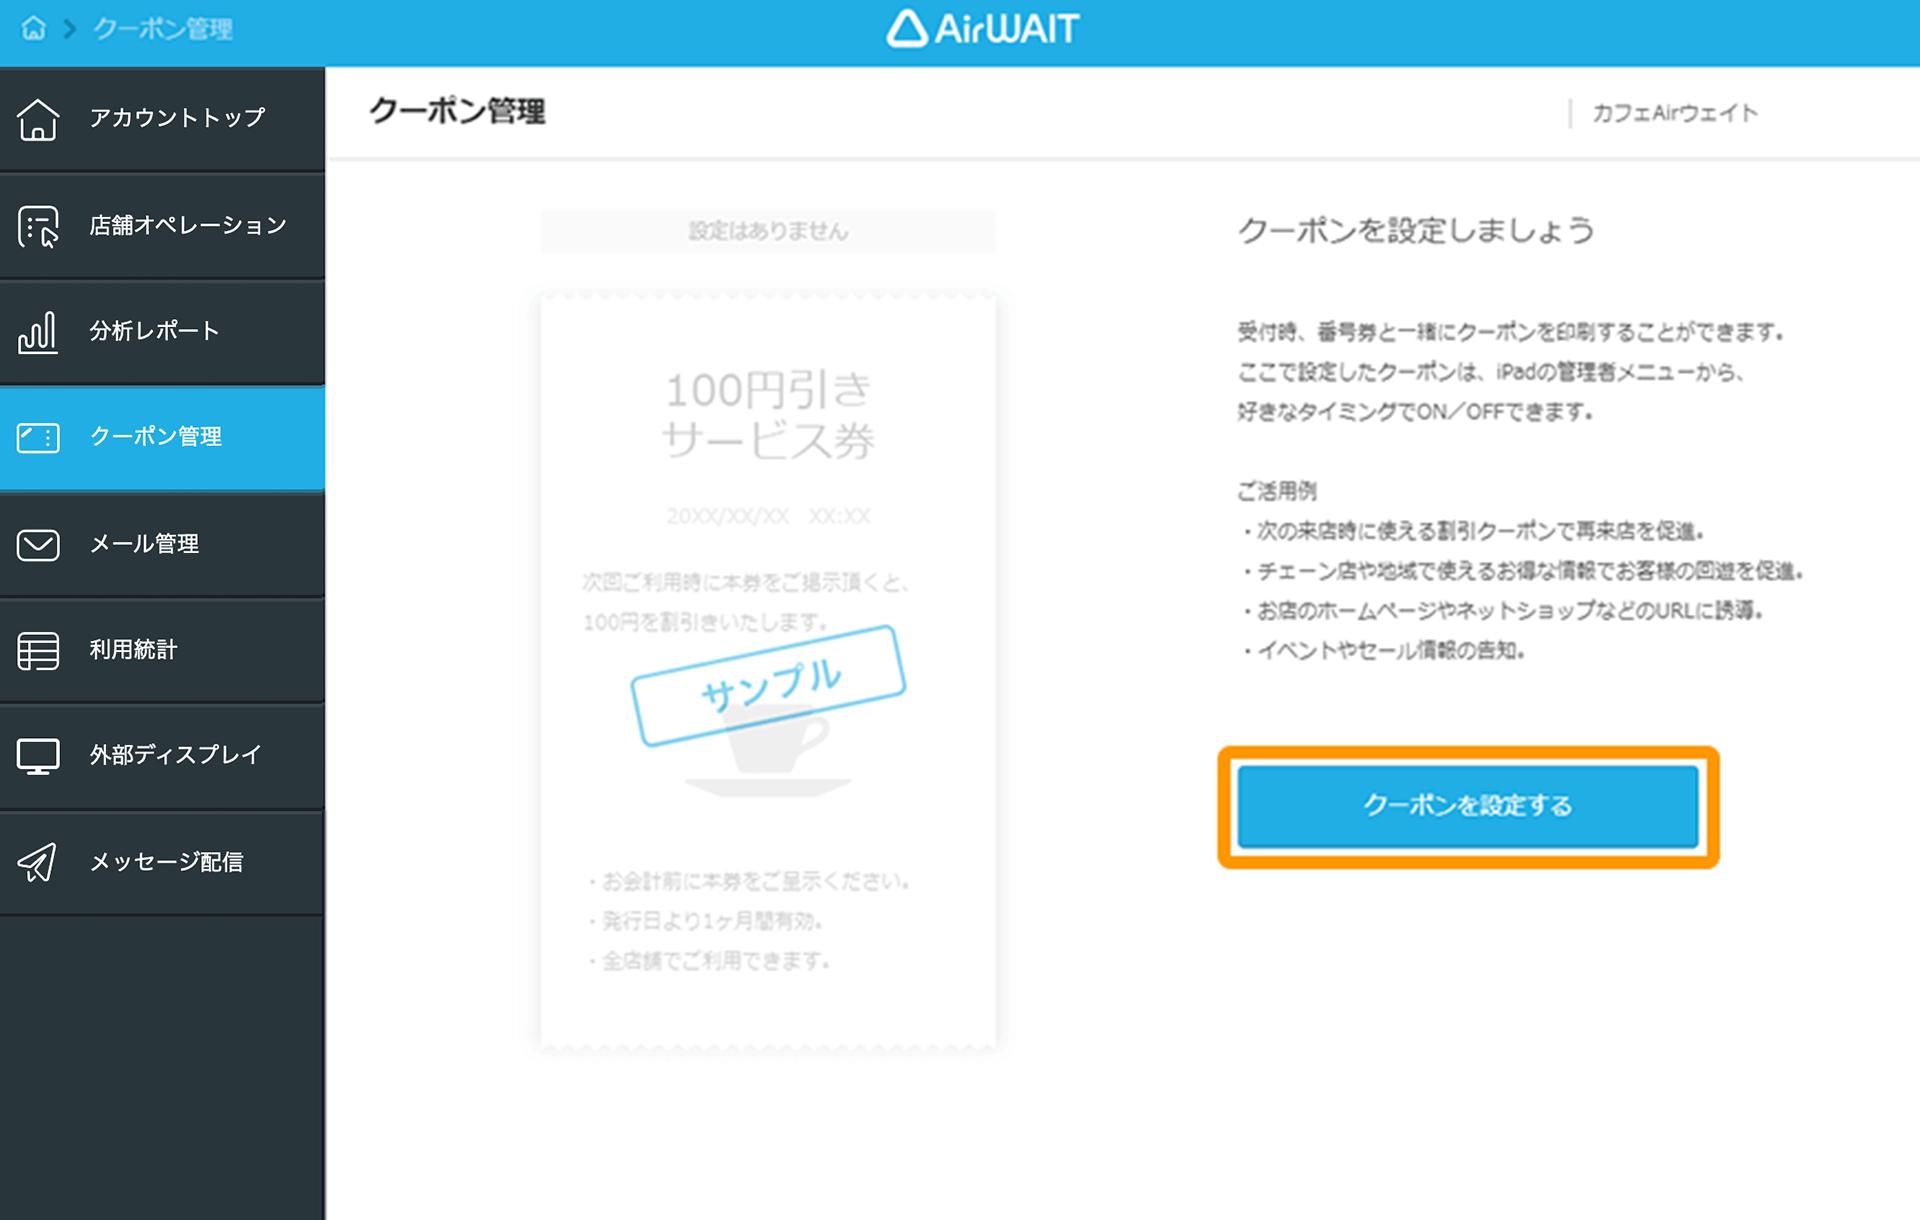 Airウェイト 店舗アカウントページ クーポン管理画面 クーポンを設定する